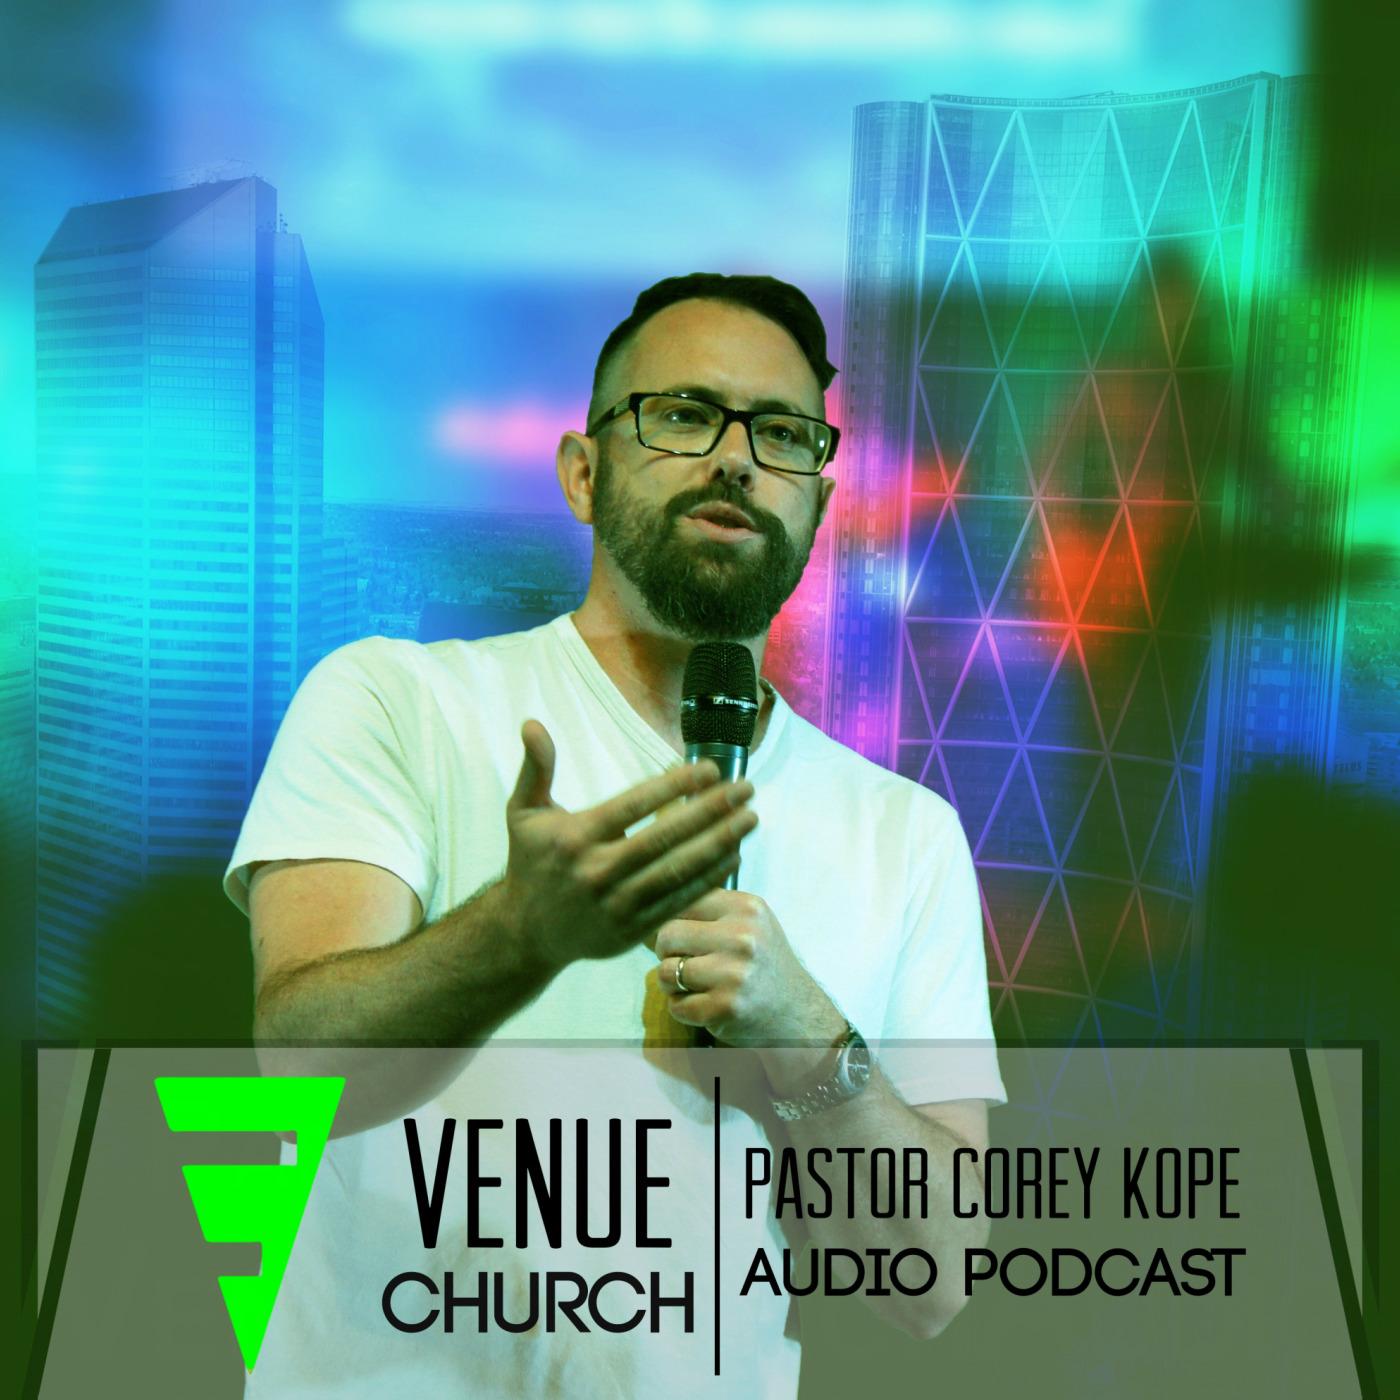 Venue Church: Corey Kope